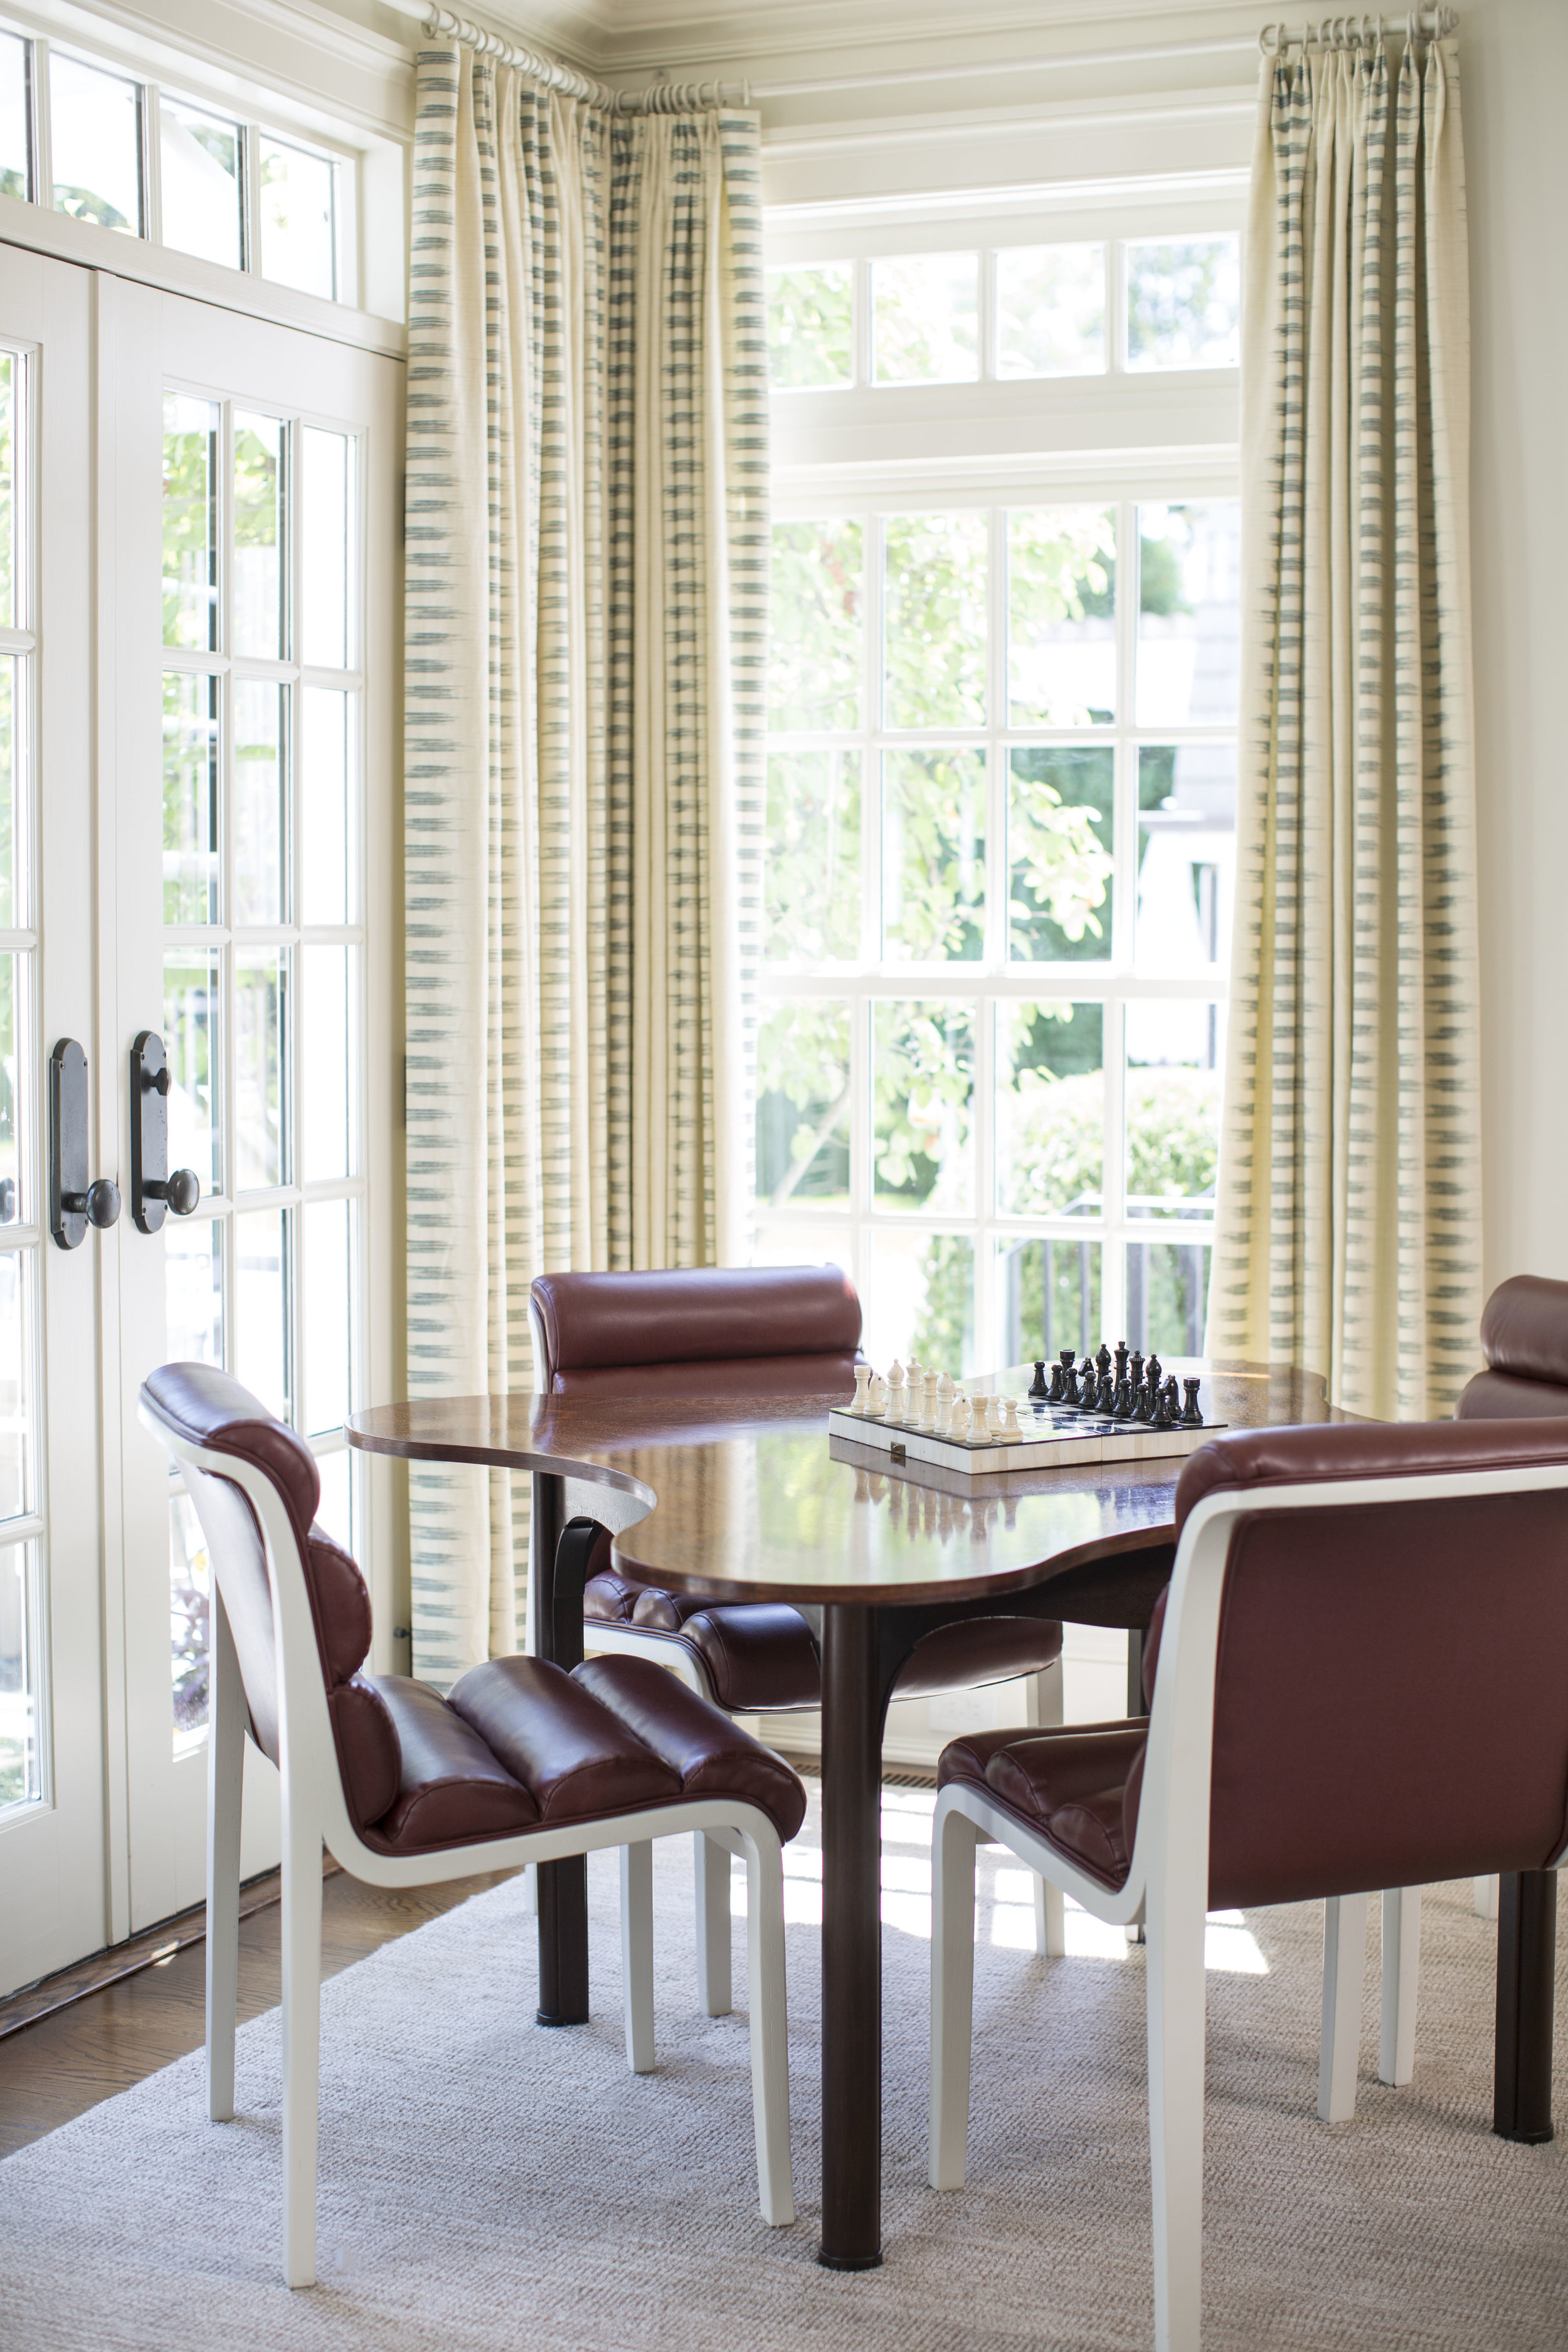 E_Hilderbrand-Interiors_Chess_63173.jpg